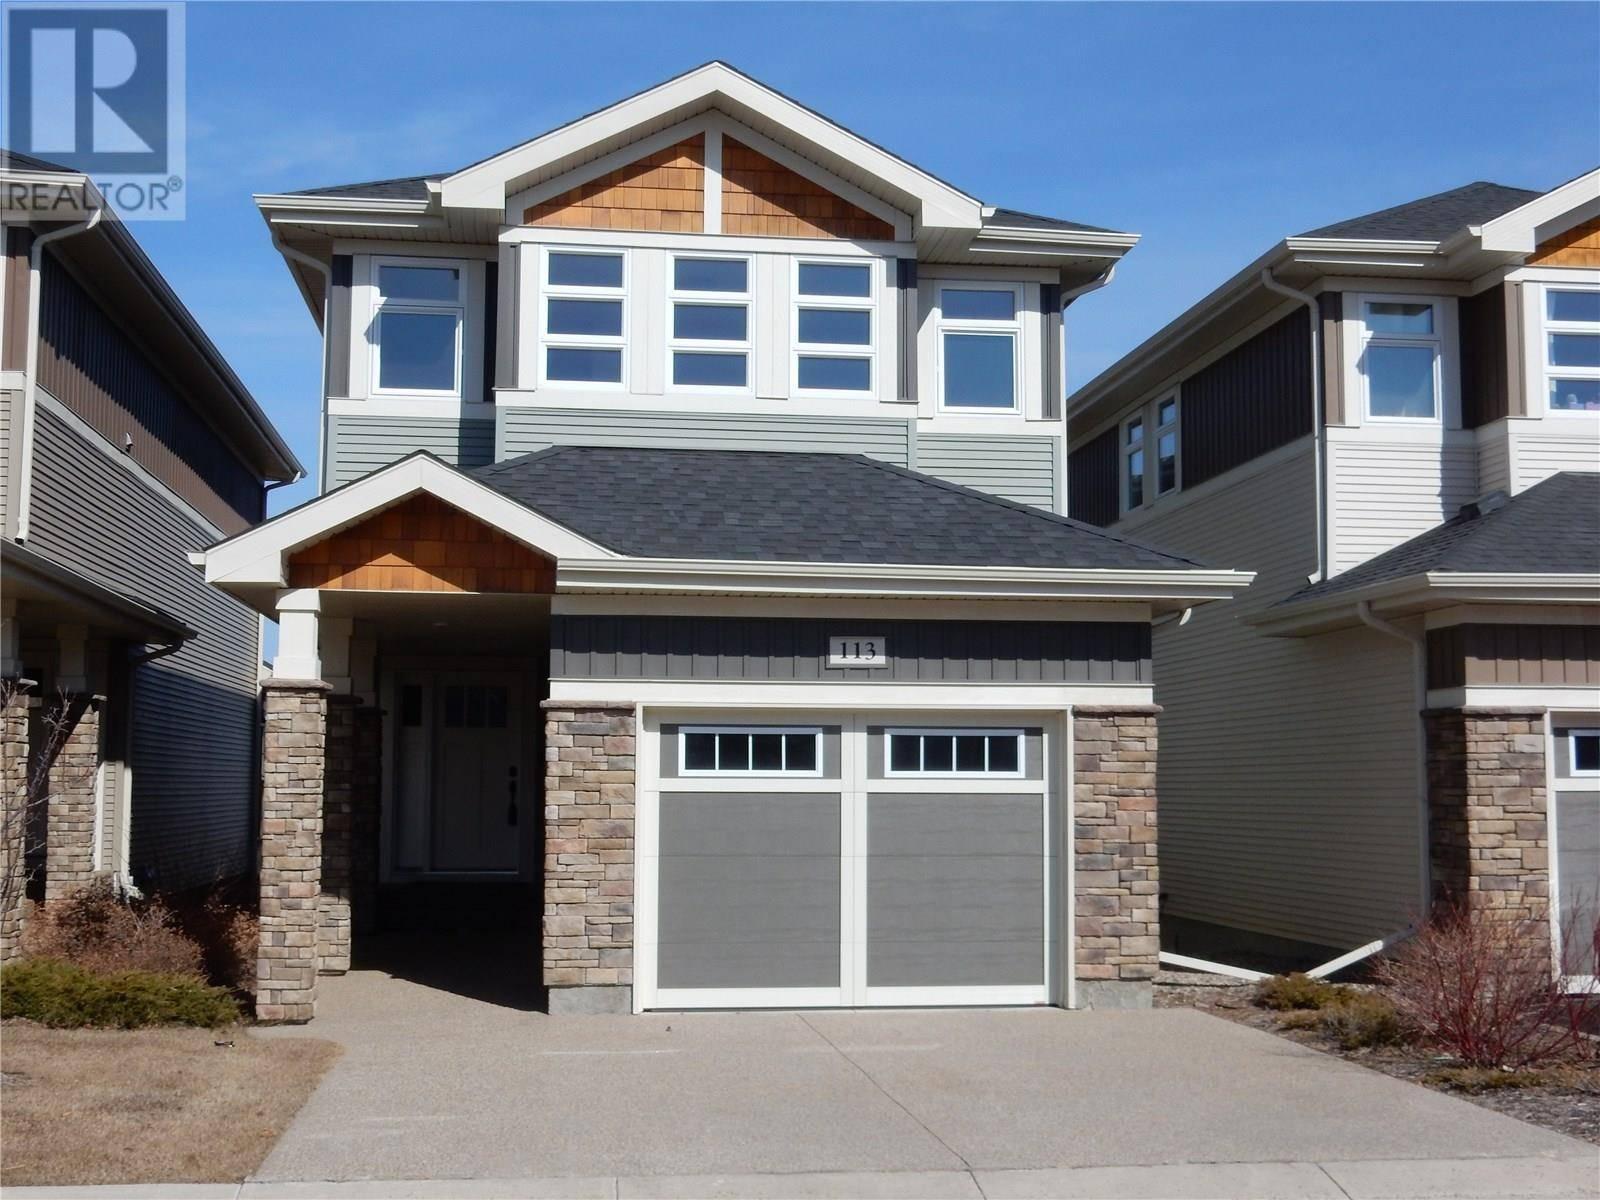 House for sale at 342 Trimble Cres Unit 113 Saskatoon Saskatchewan - MLS: SK783809